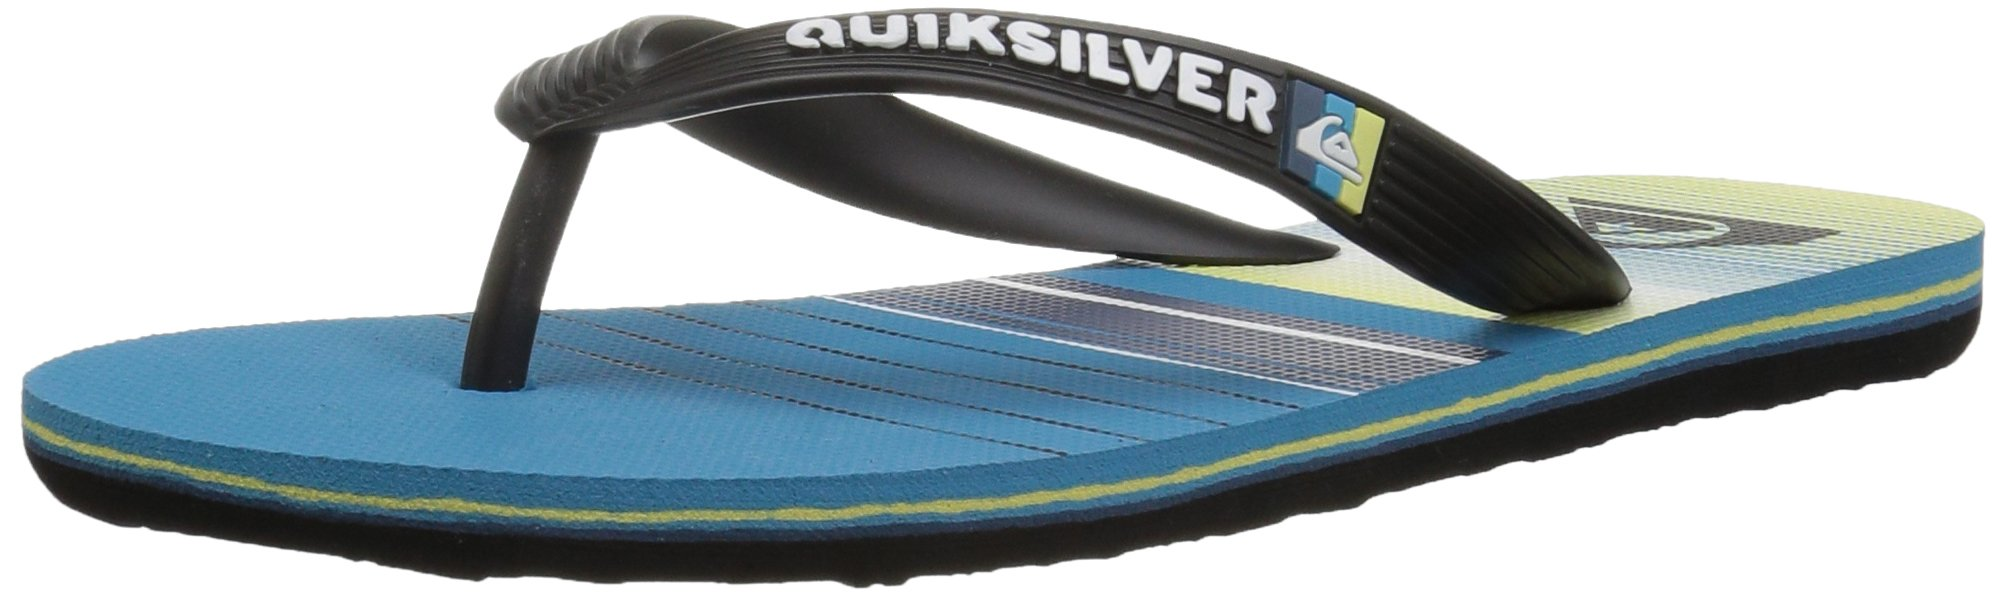 Quiksilver Boys' Molokai SWELL Vision Youth Sandal Black Blue, 12(29) M US Little Kid